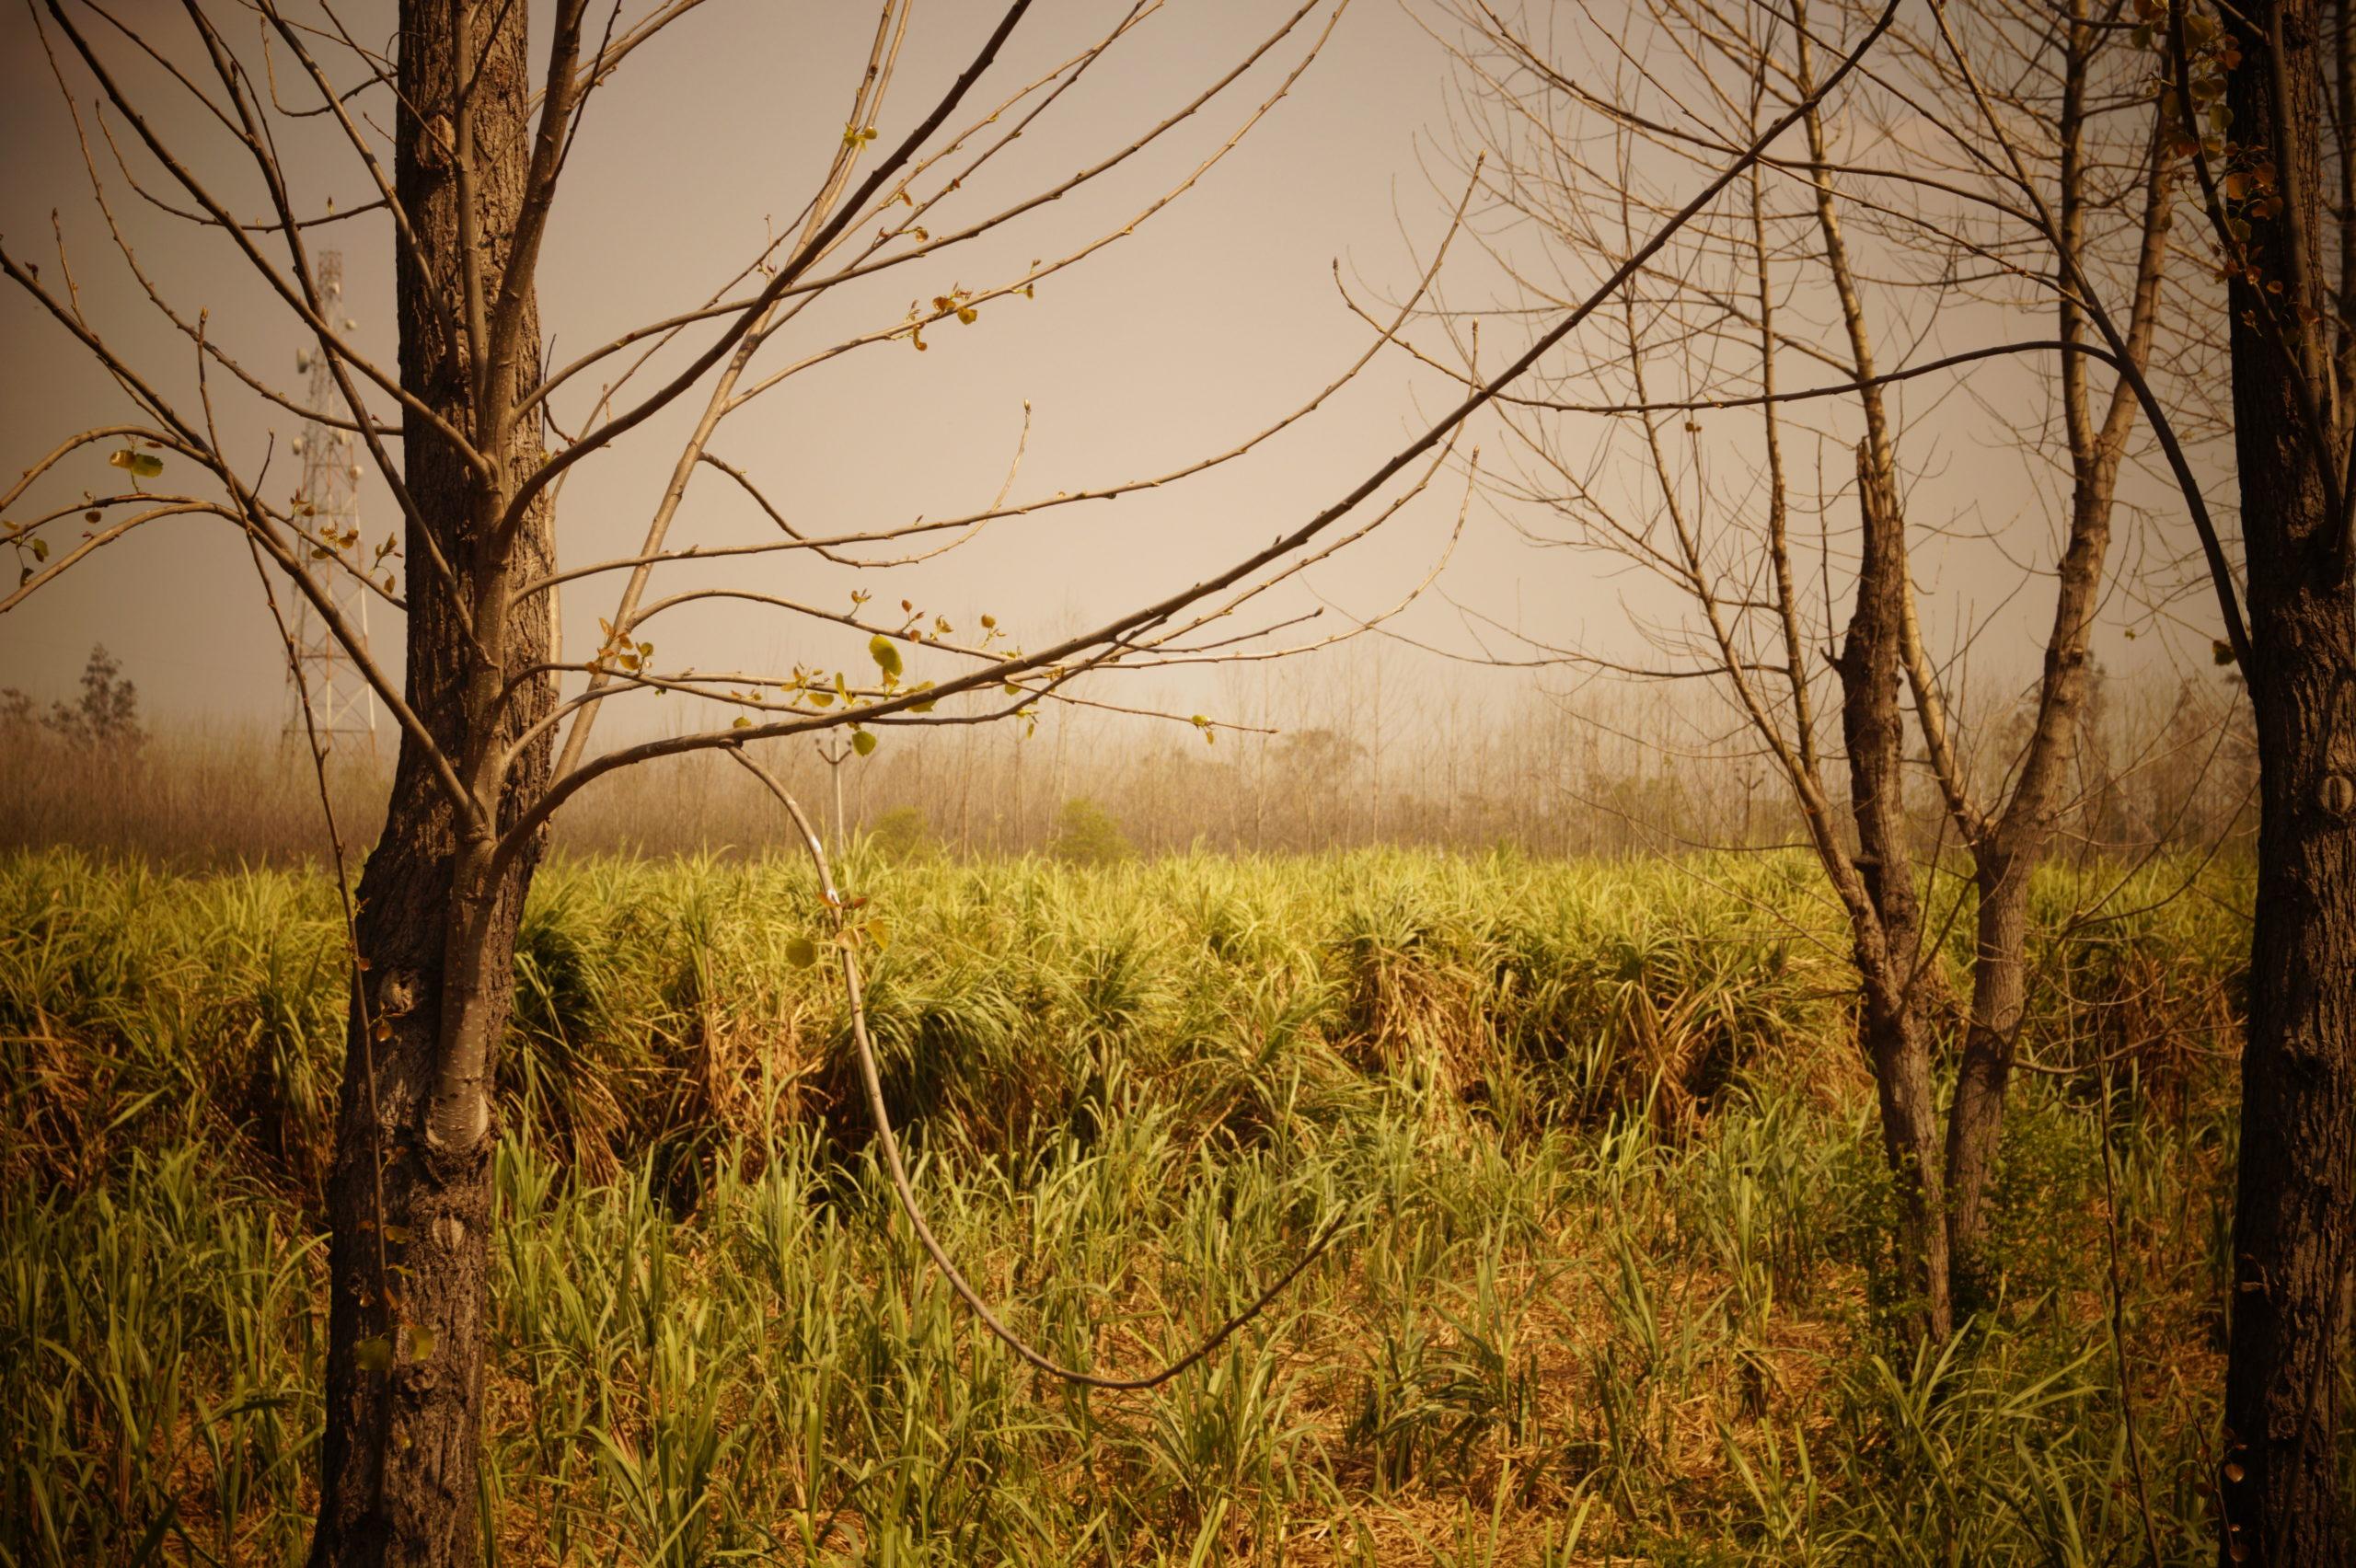 Life-of-Pix-free-stock-photos-fields-nature-trees-mist-aman-goyal